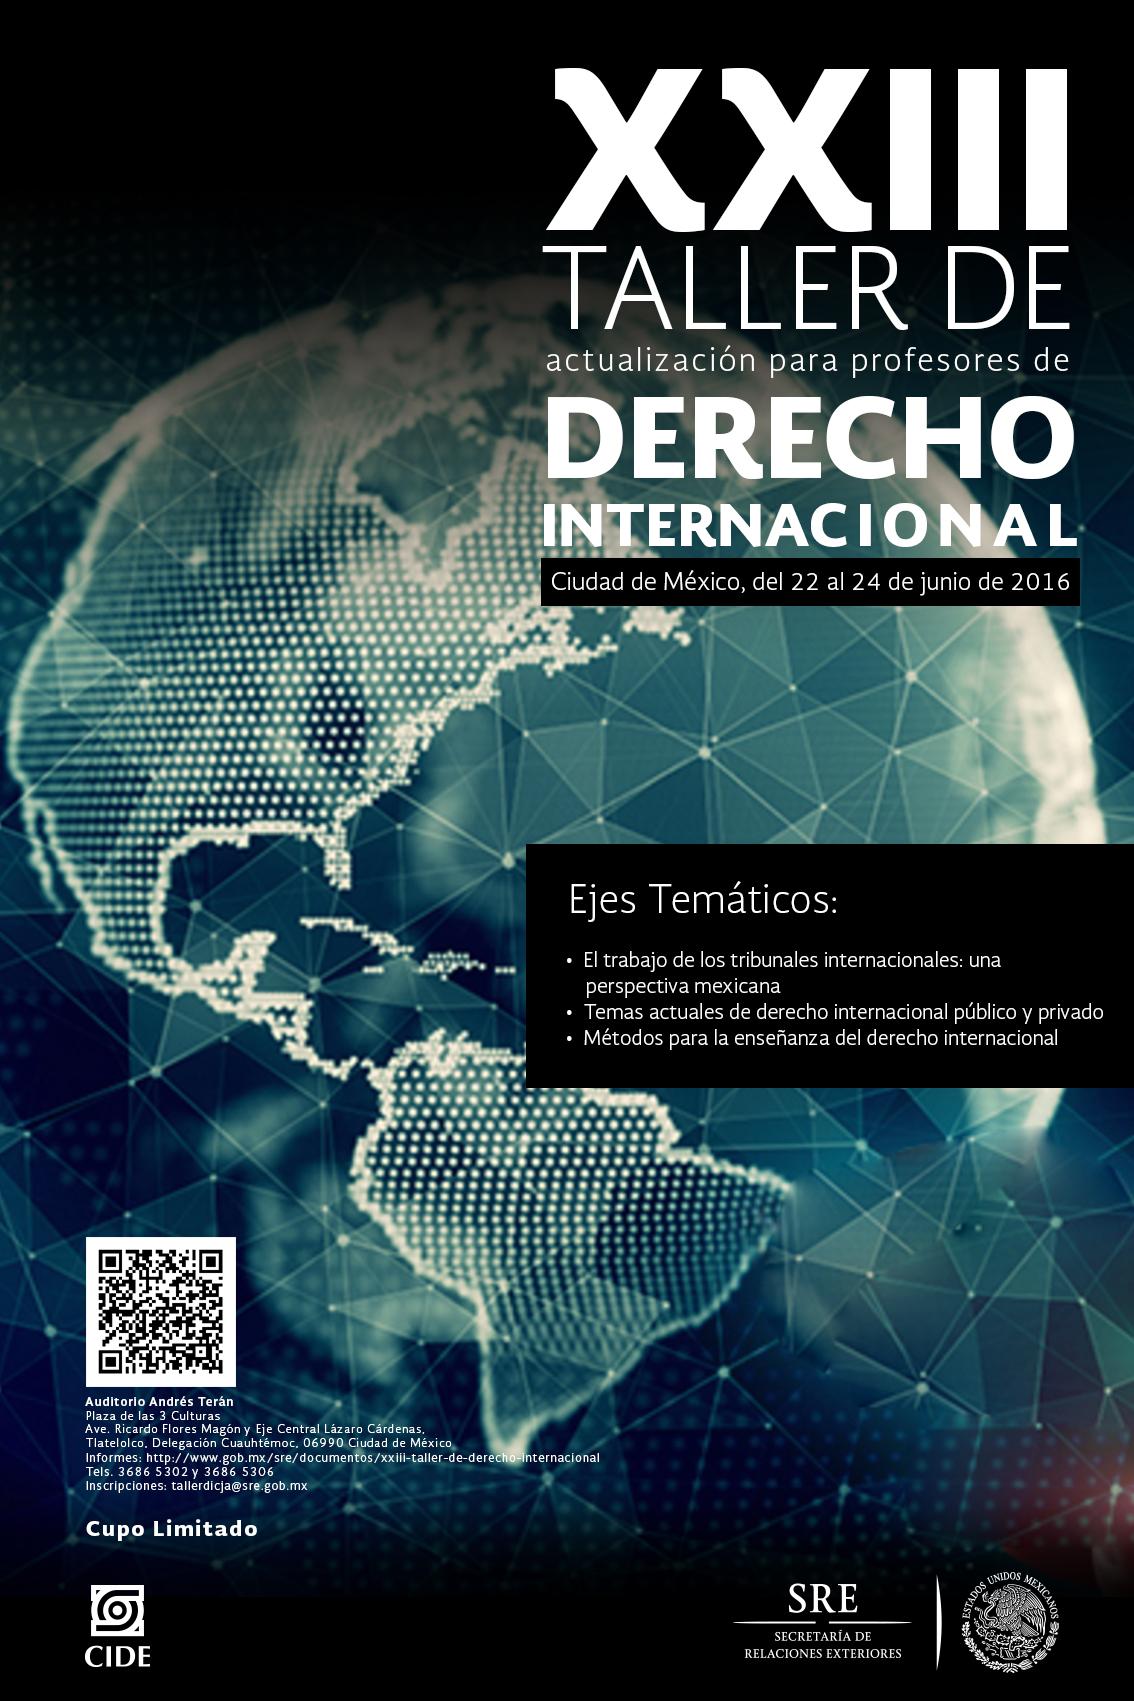 Invitación «XXIII Taller de Derecho Internacional»